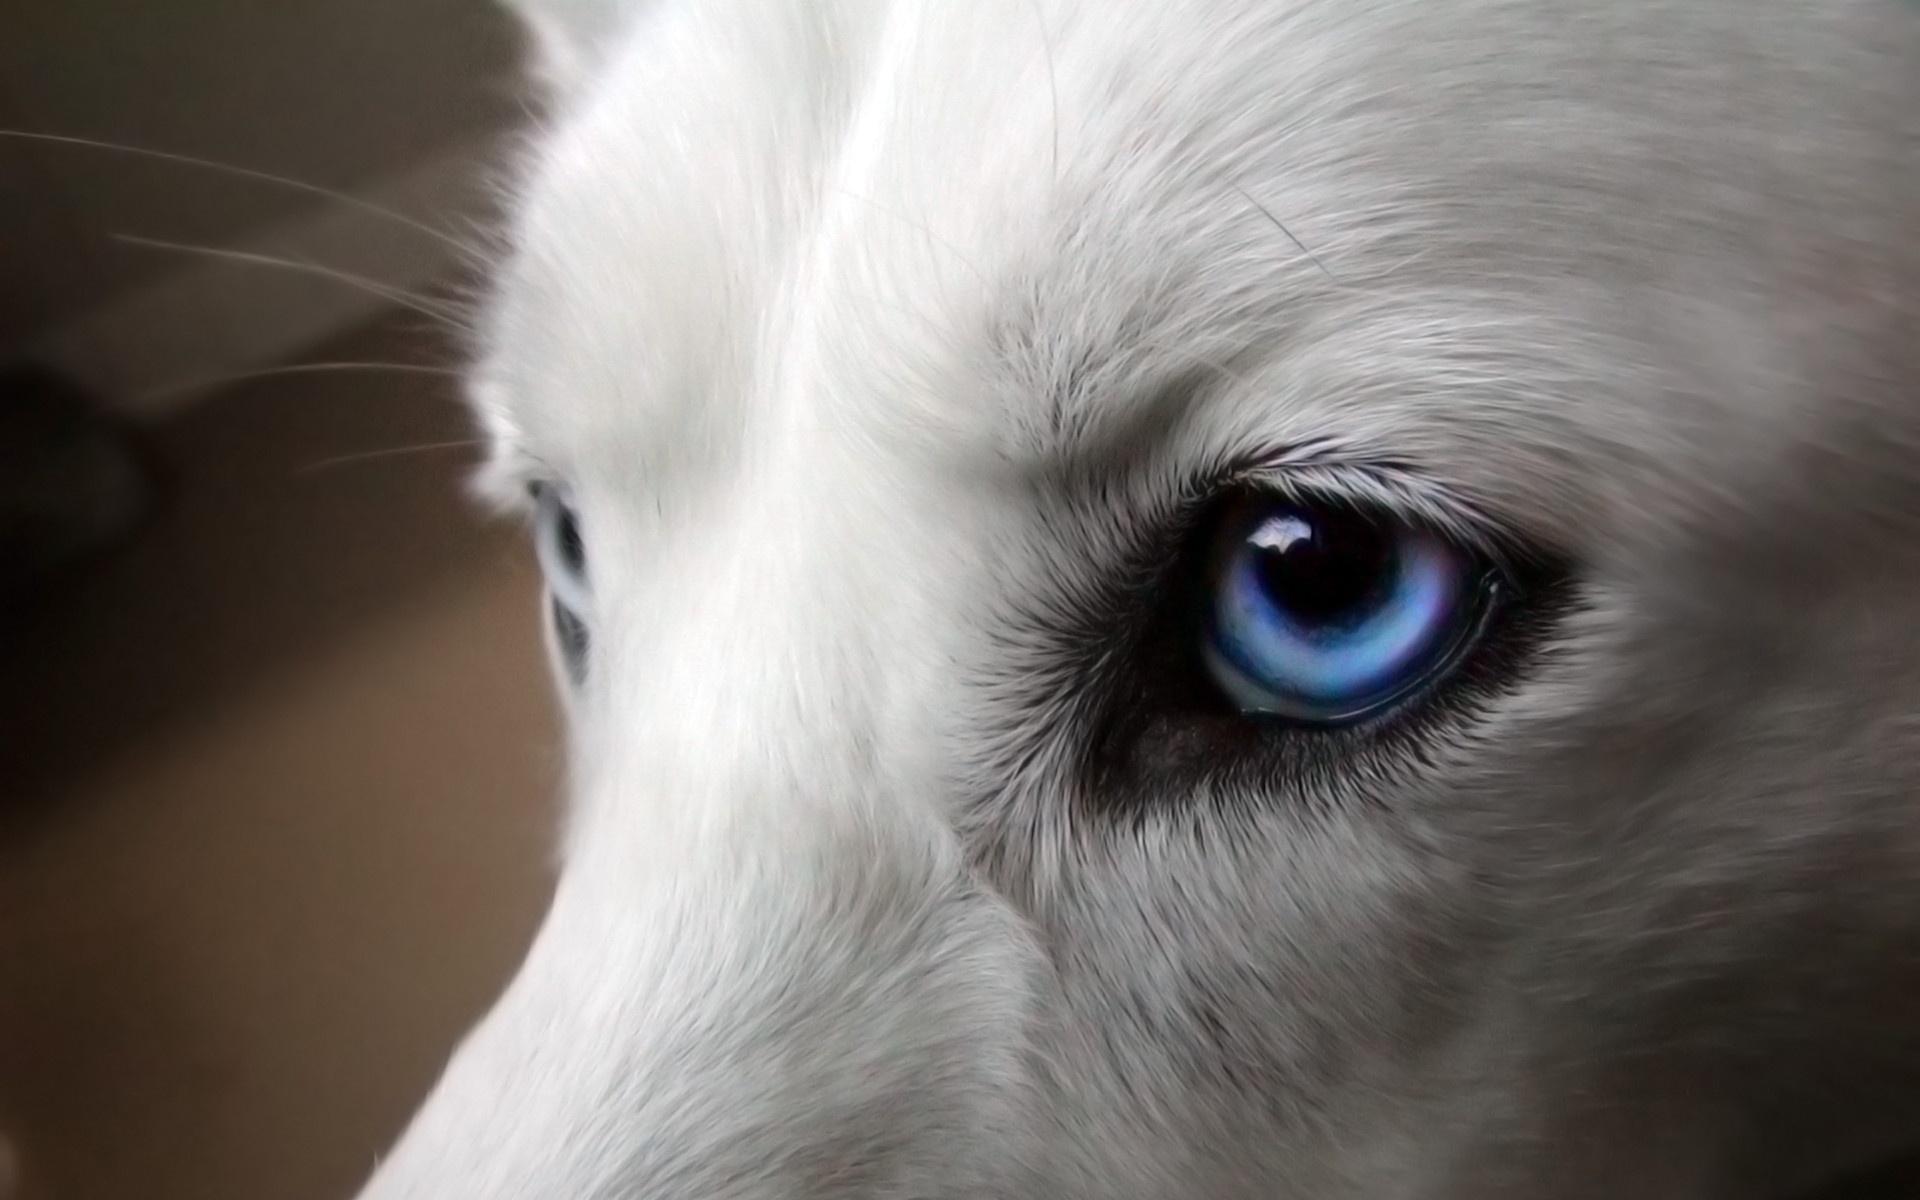 Волчьи глаза бесплатно